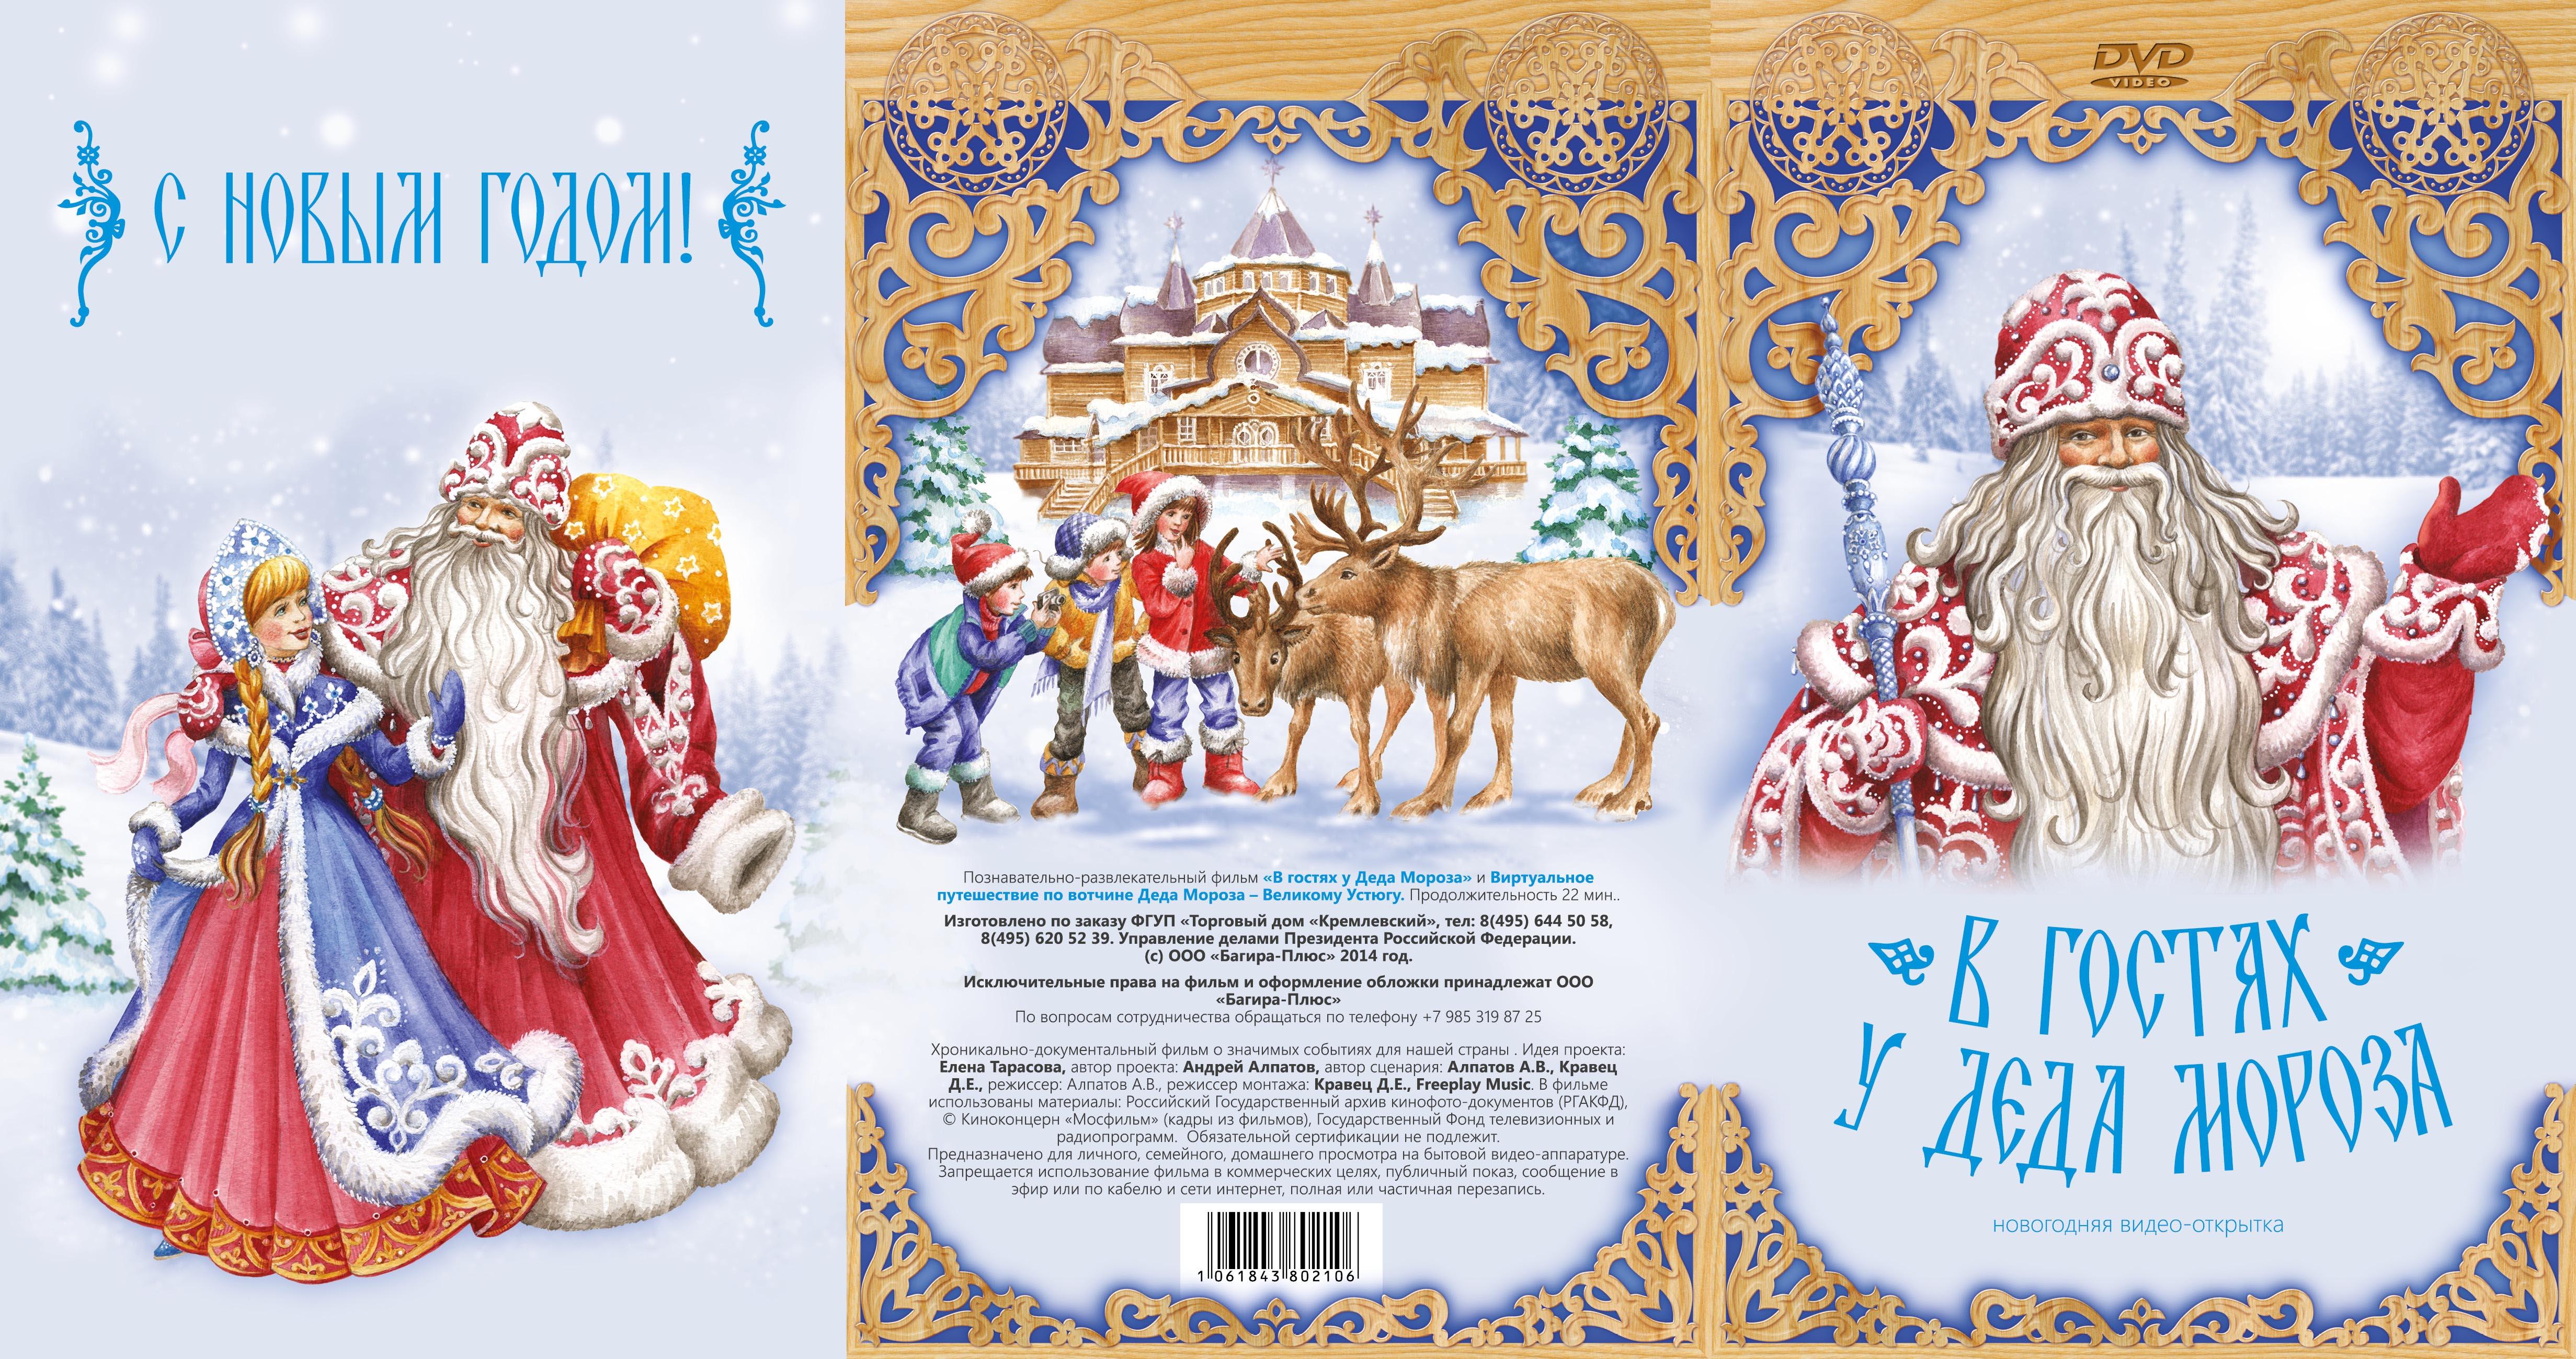 Dvd открытка в гостях у деда мороза